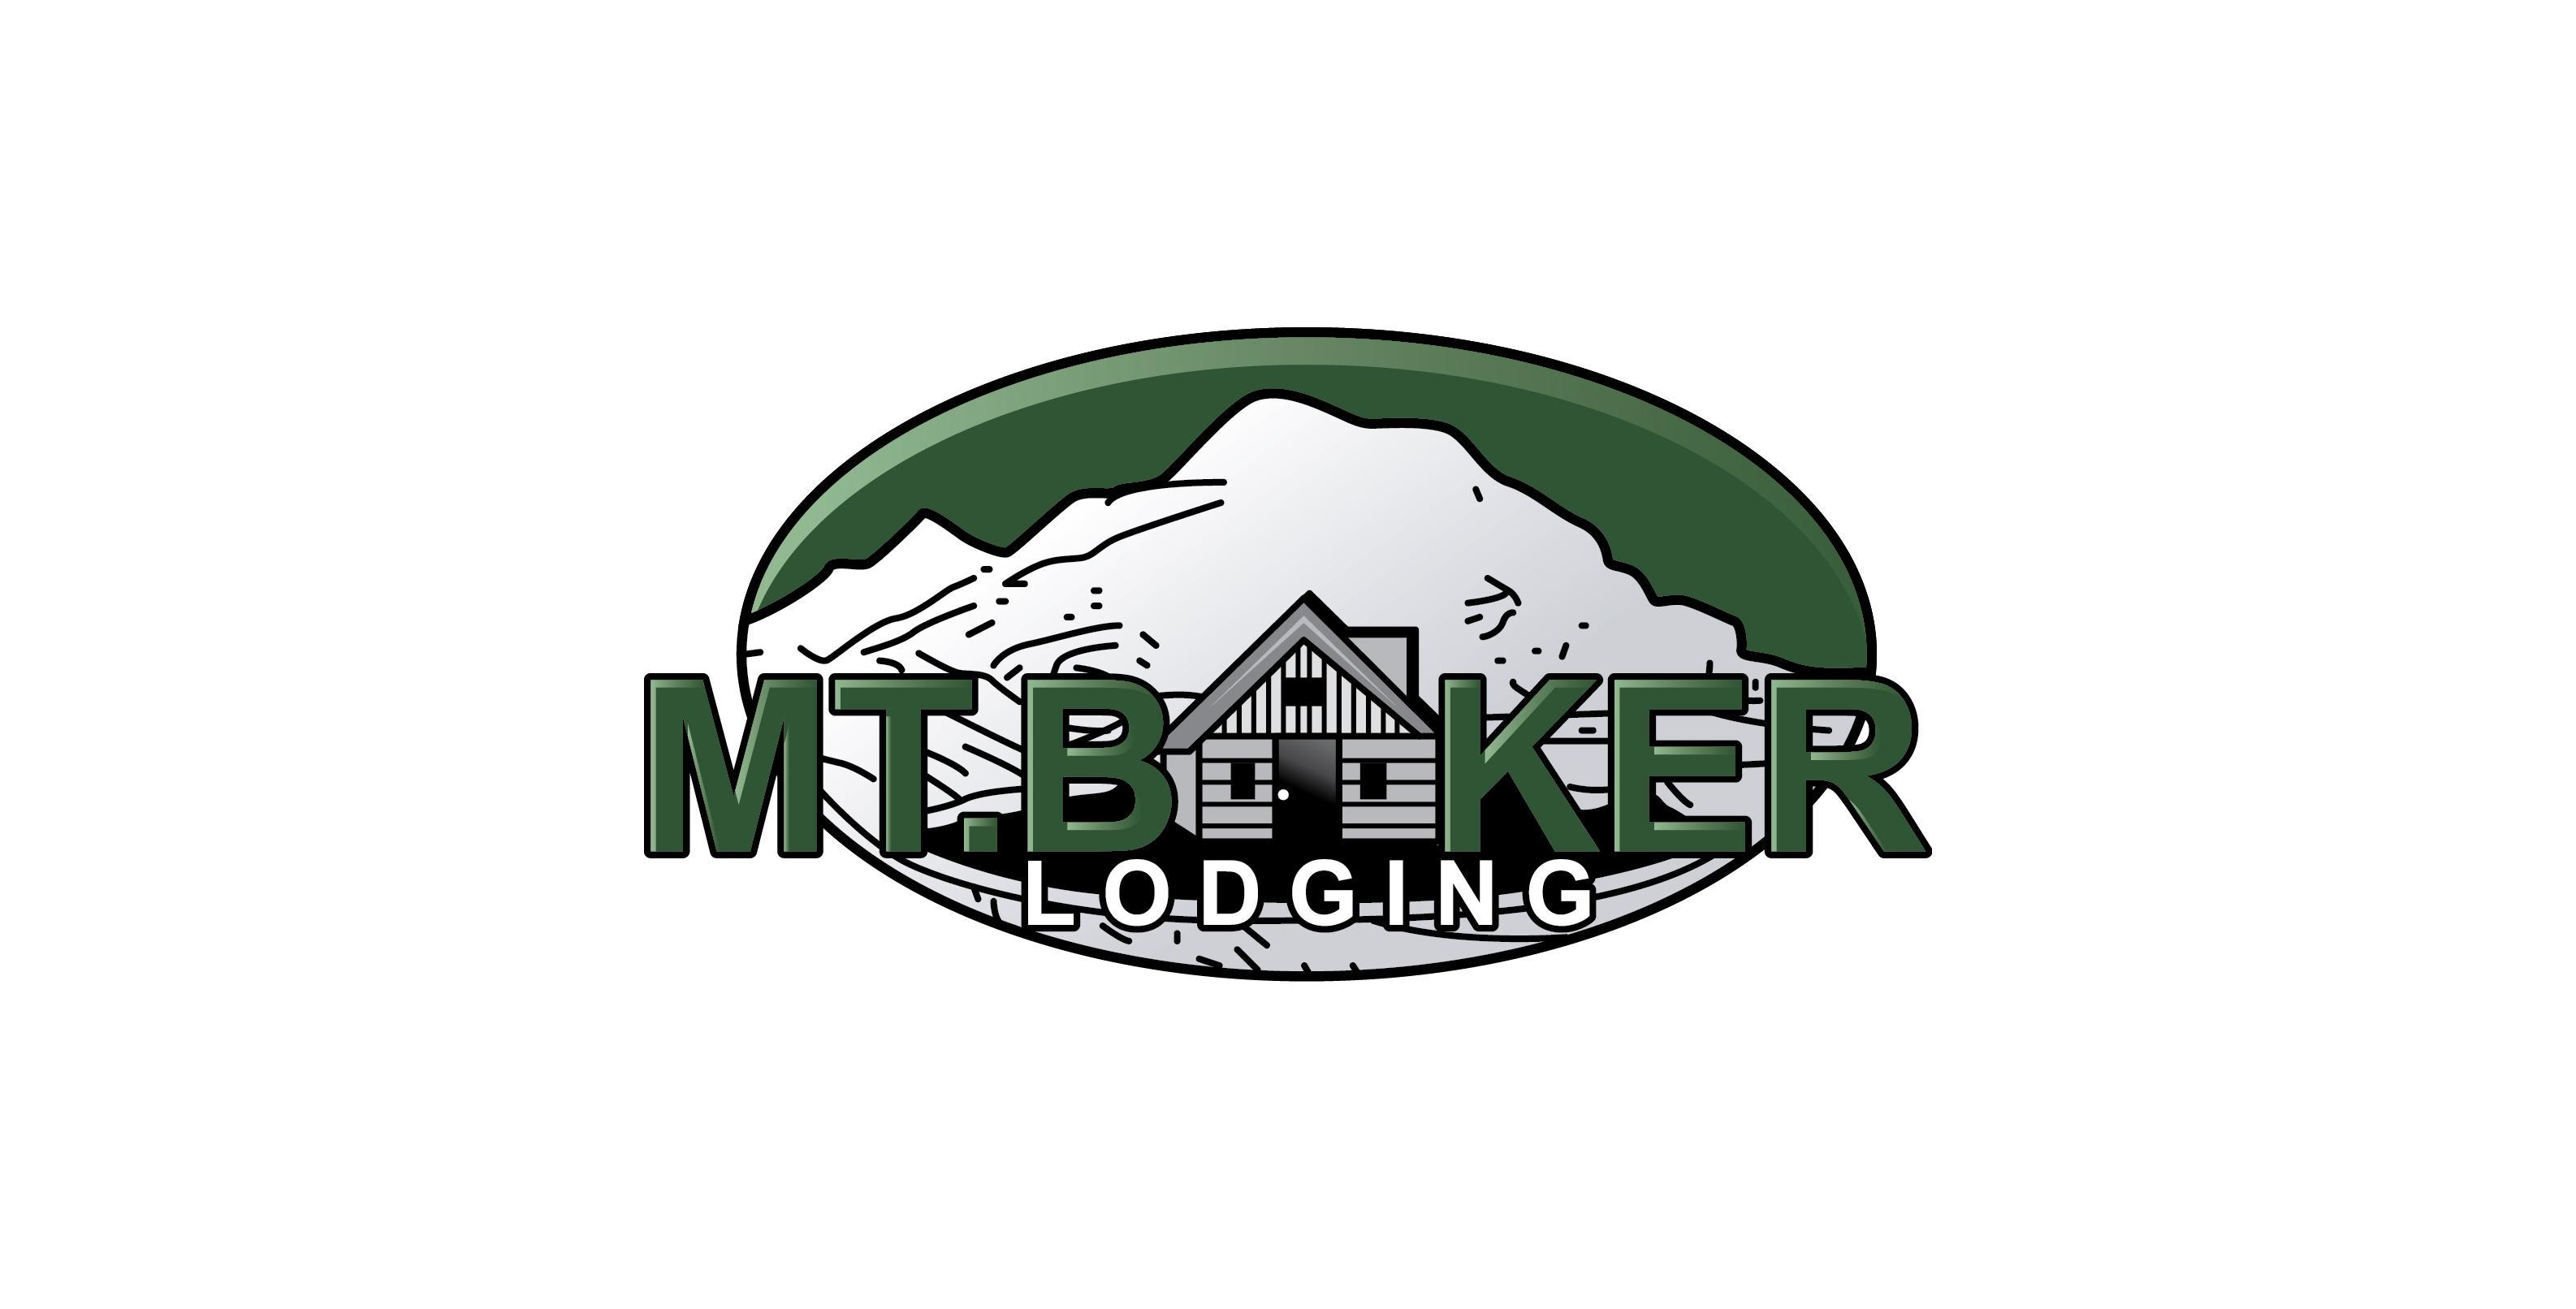 Apartment Mt  Baker Lodging Cabin  17     REAL LOG CABIN  BBQ  PETS OK  SLEEPS-8  photo 31816931